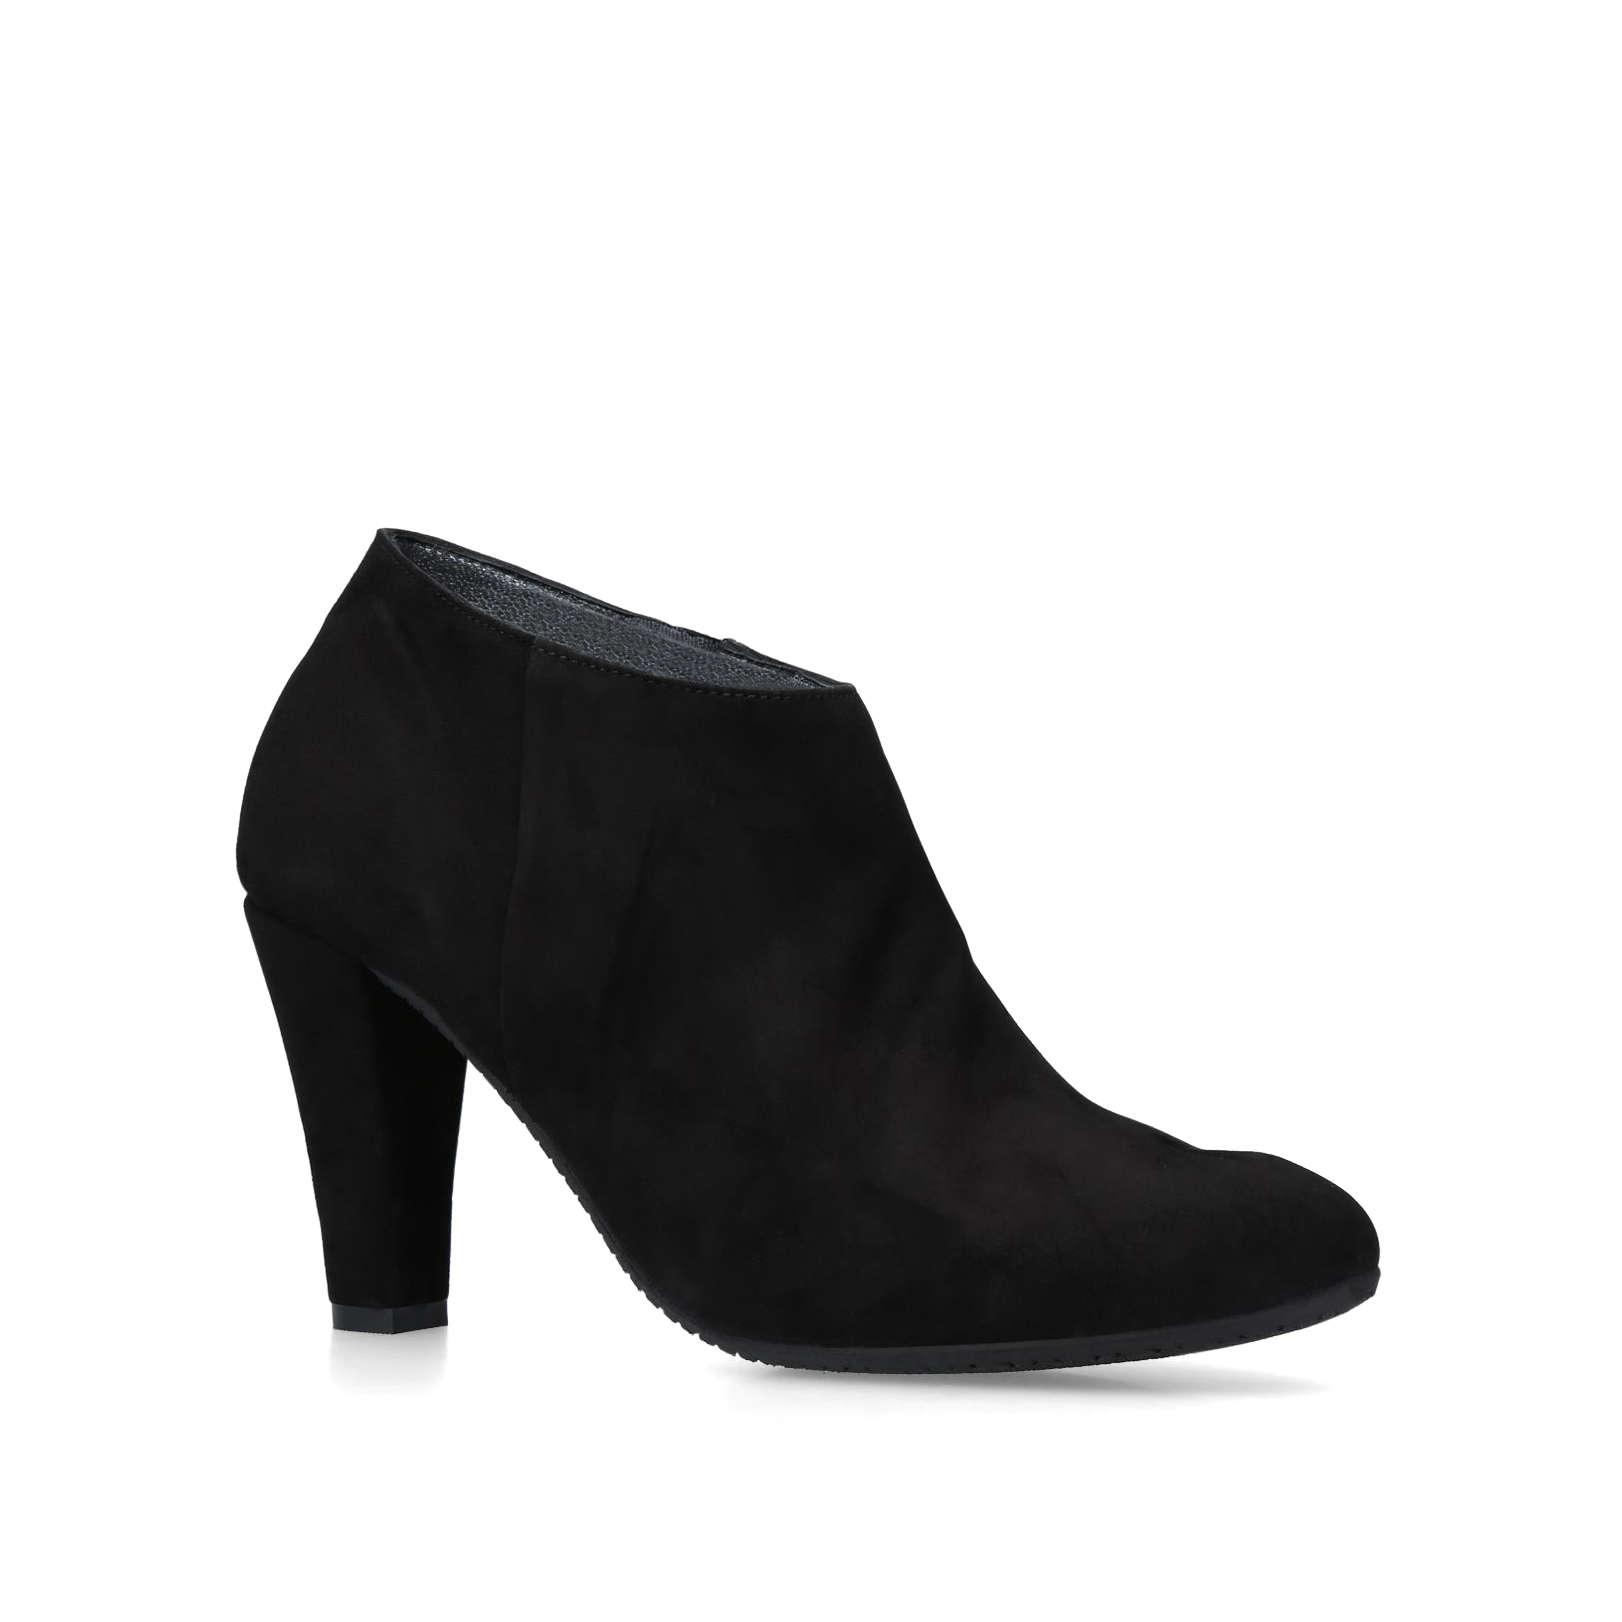 ROSS - CARVELA COMFORT Ankle Boots